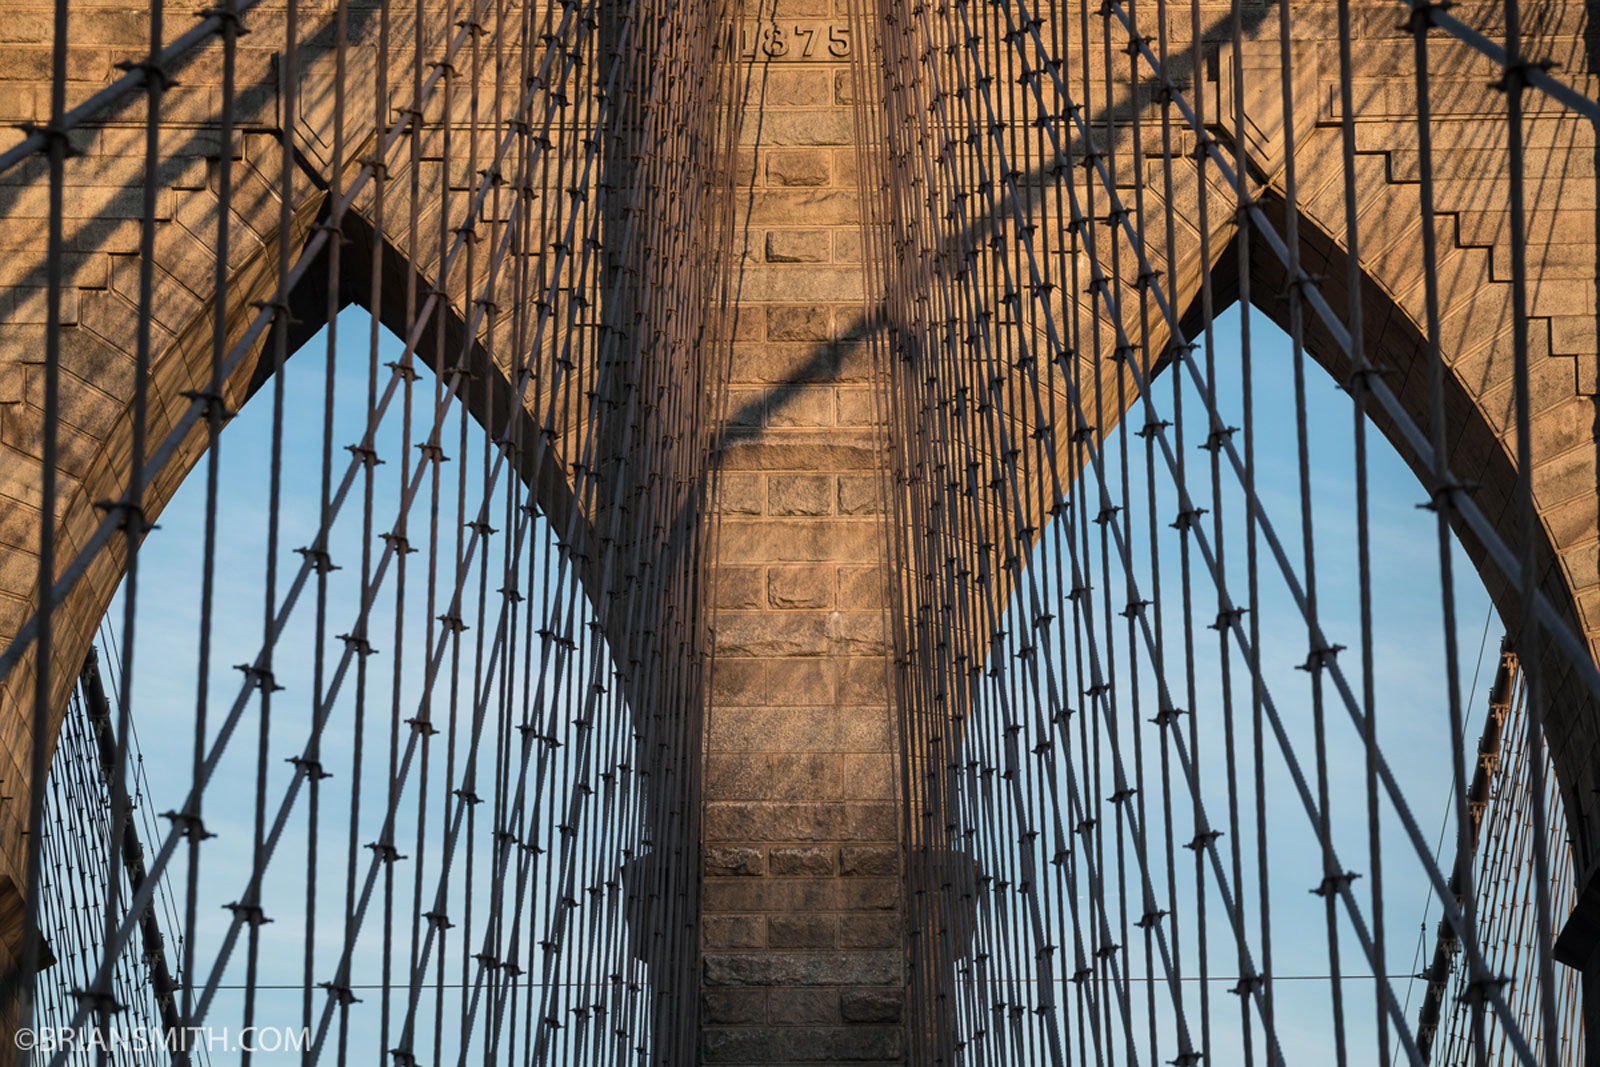 Sony a7R II Brooklyn Bridge New York Field Test Review